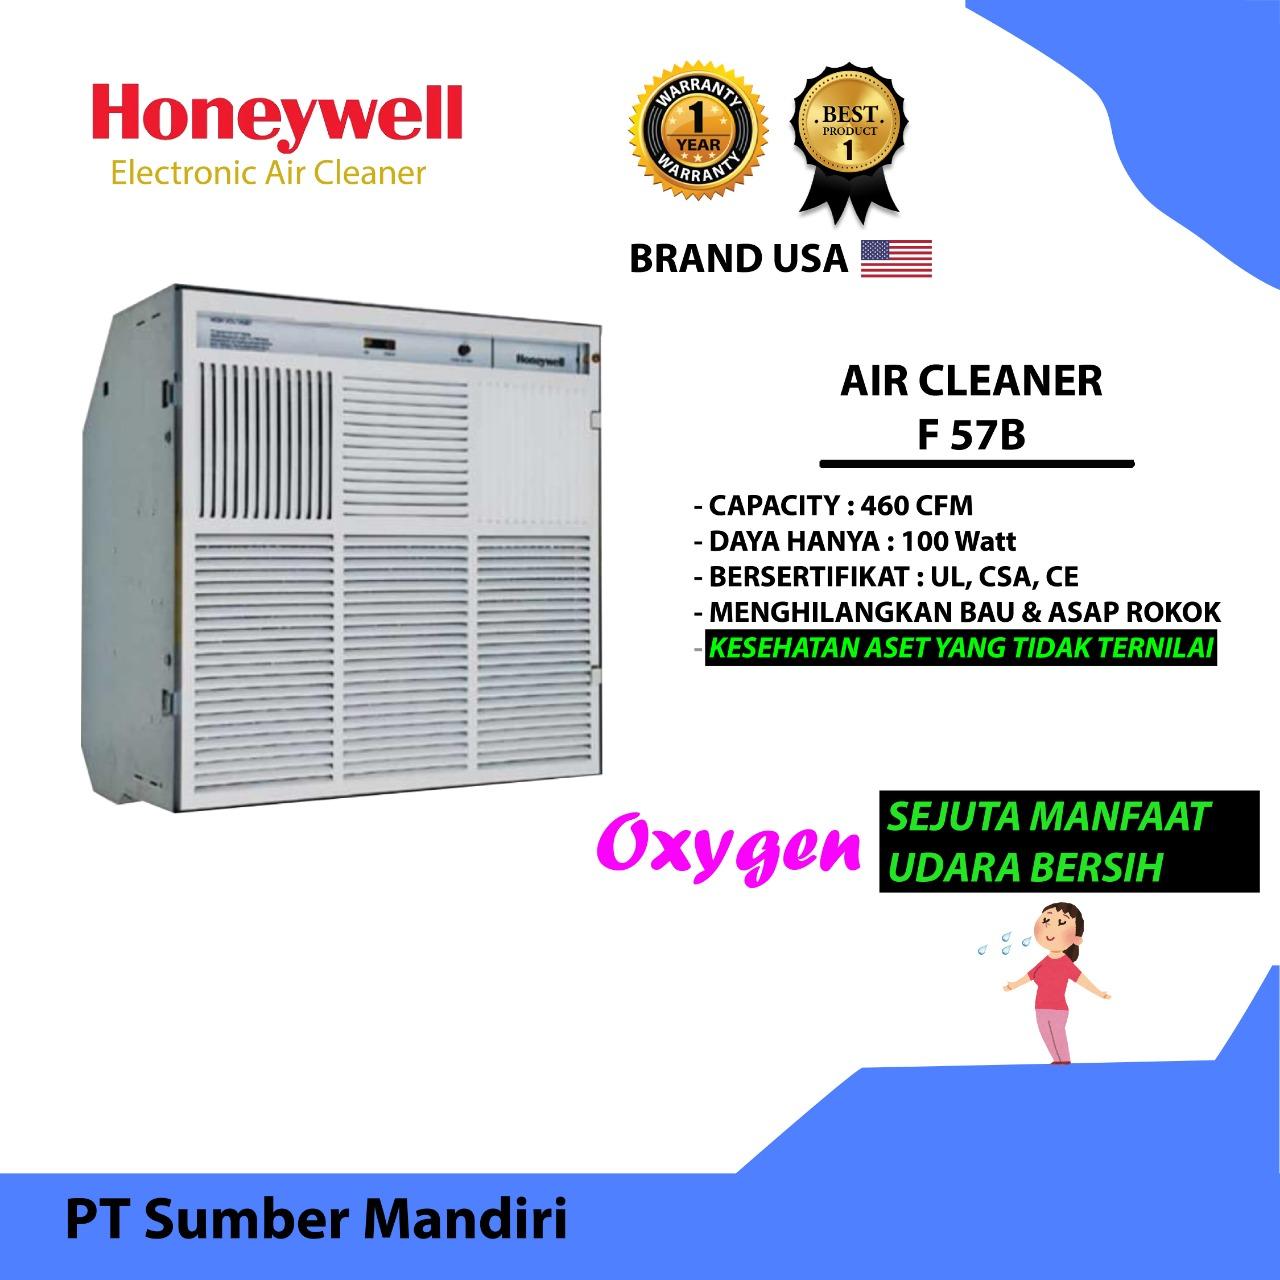 Air Cleaner Honeywell F 57B